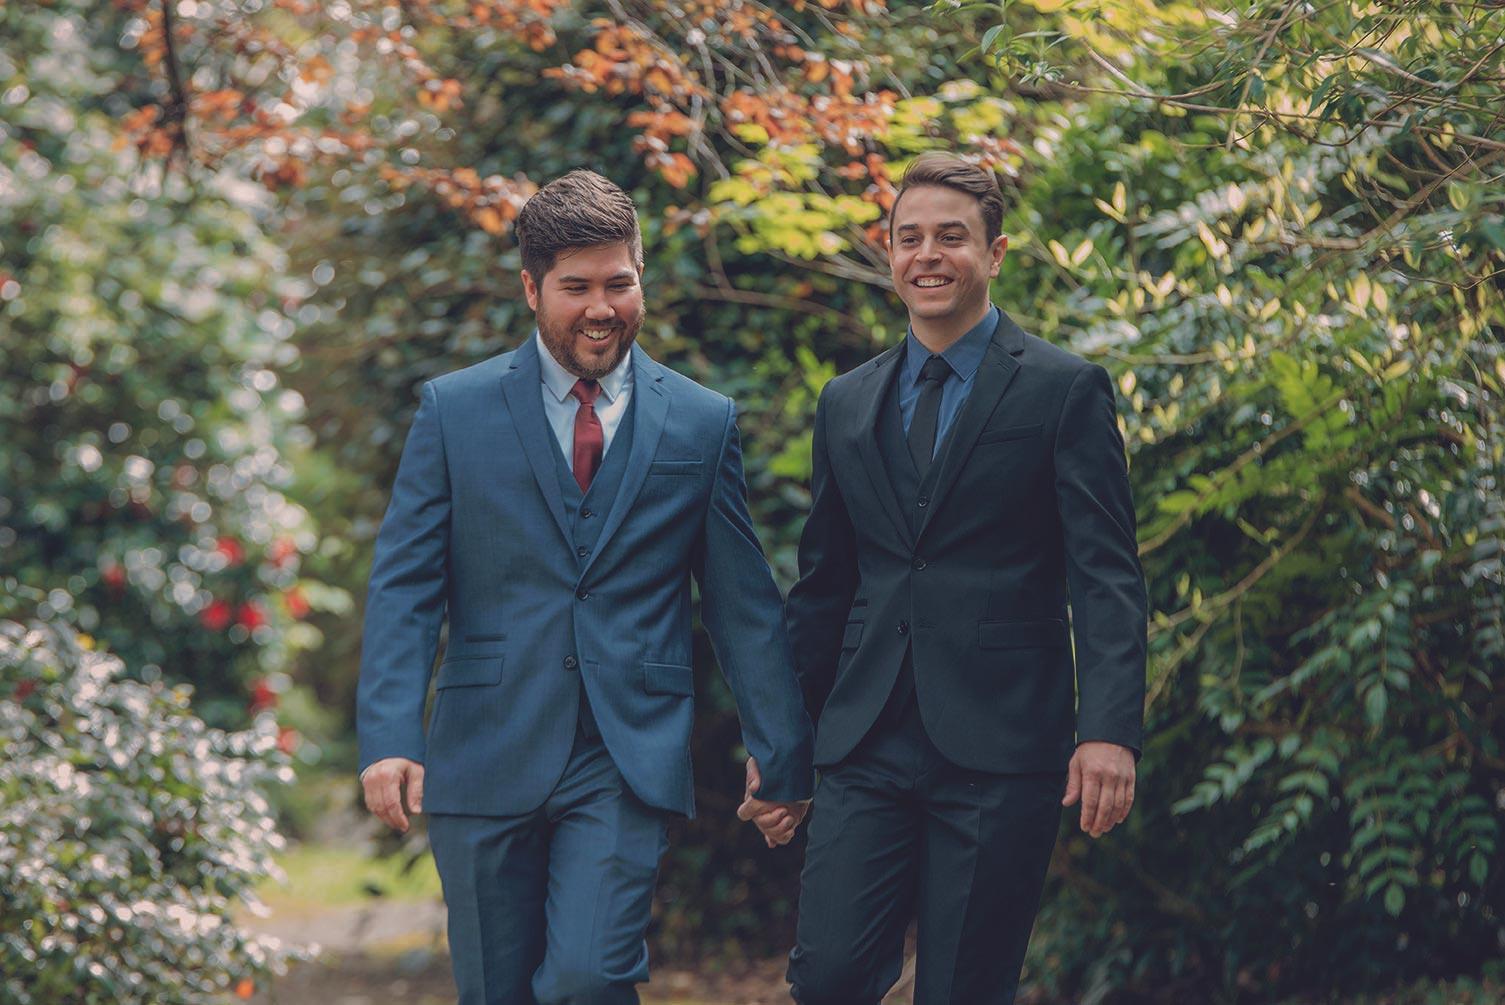 sanders-mann-wedding-2016-36